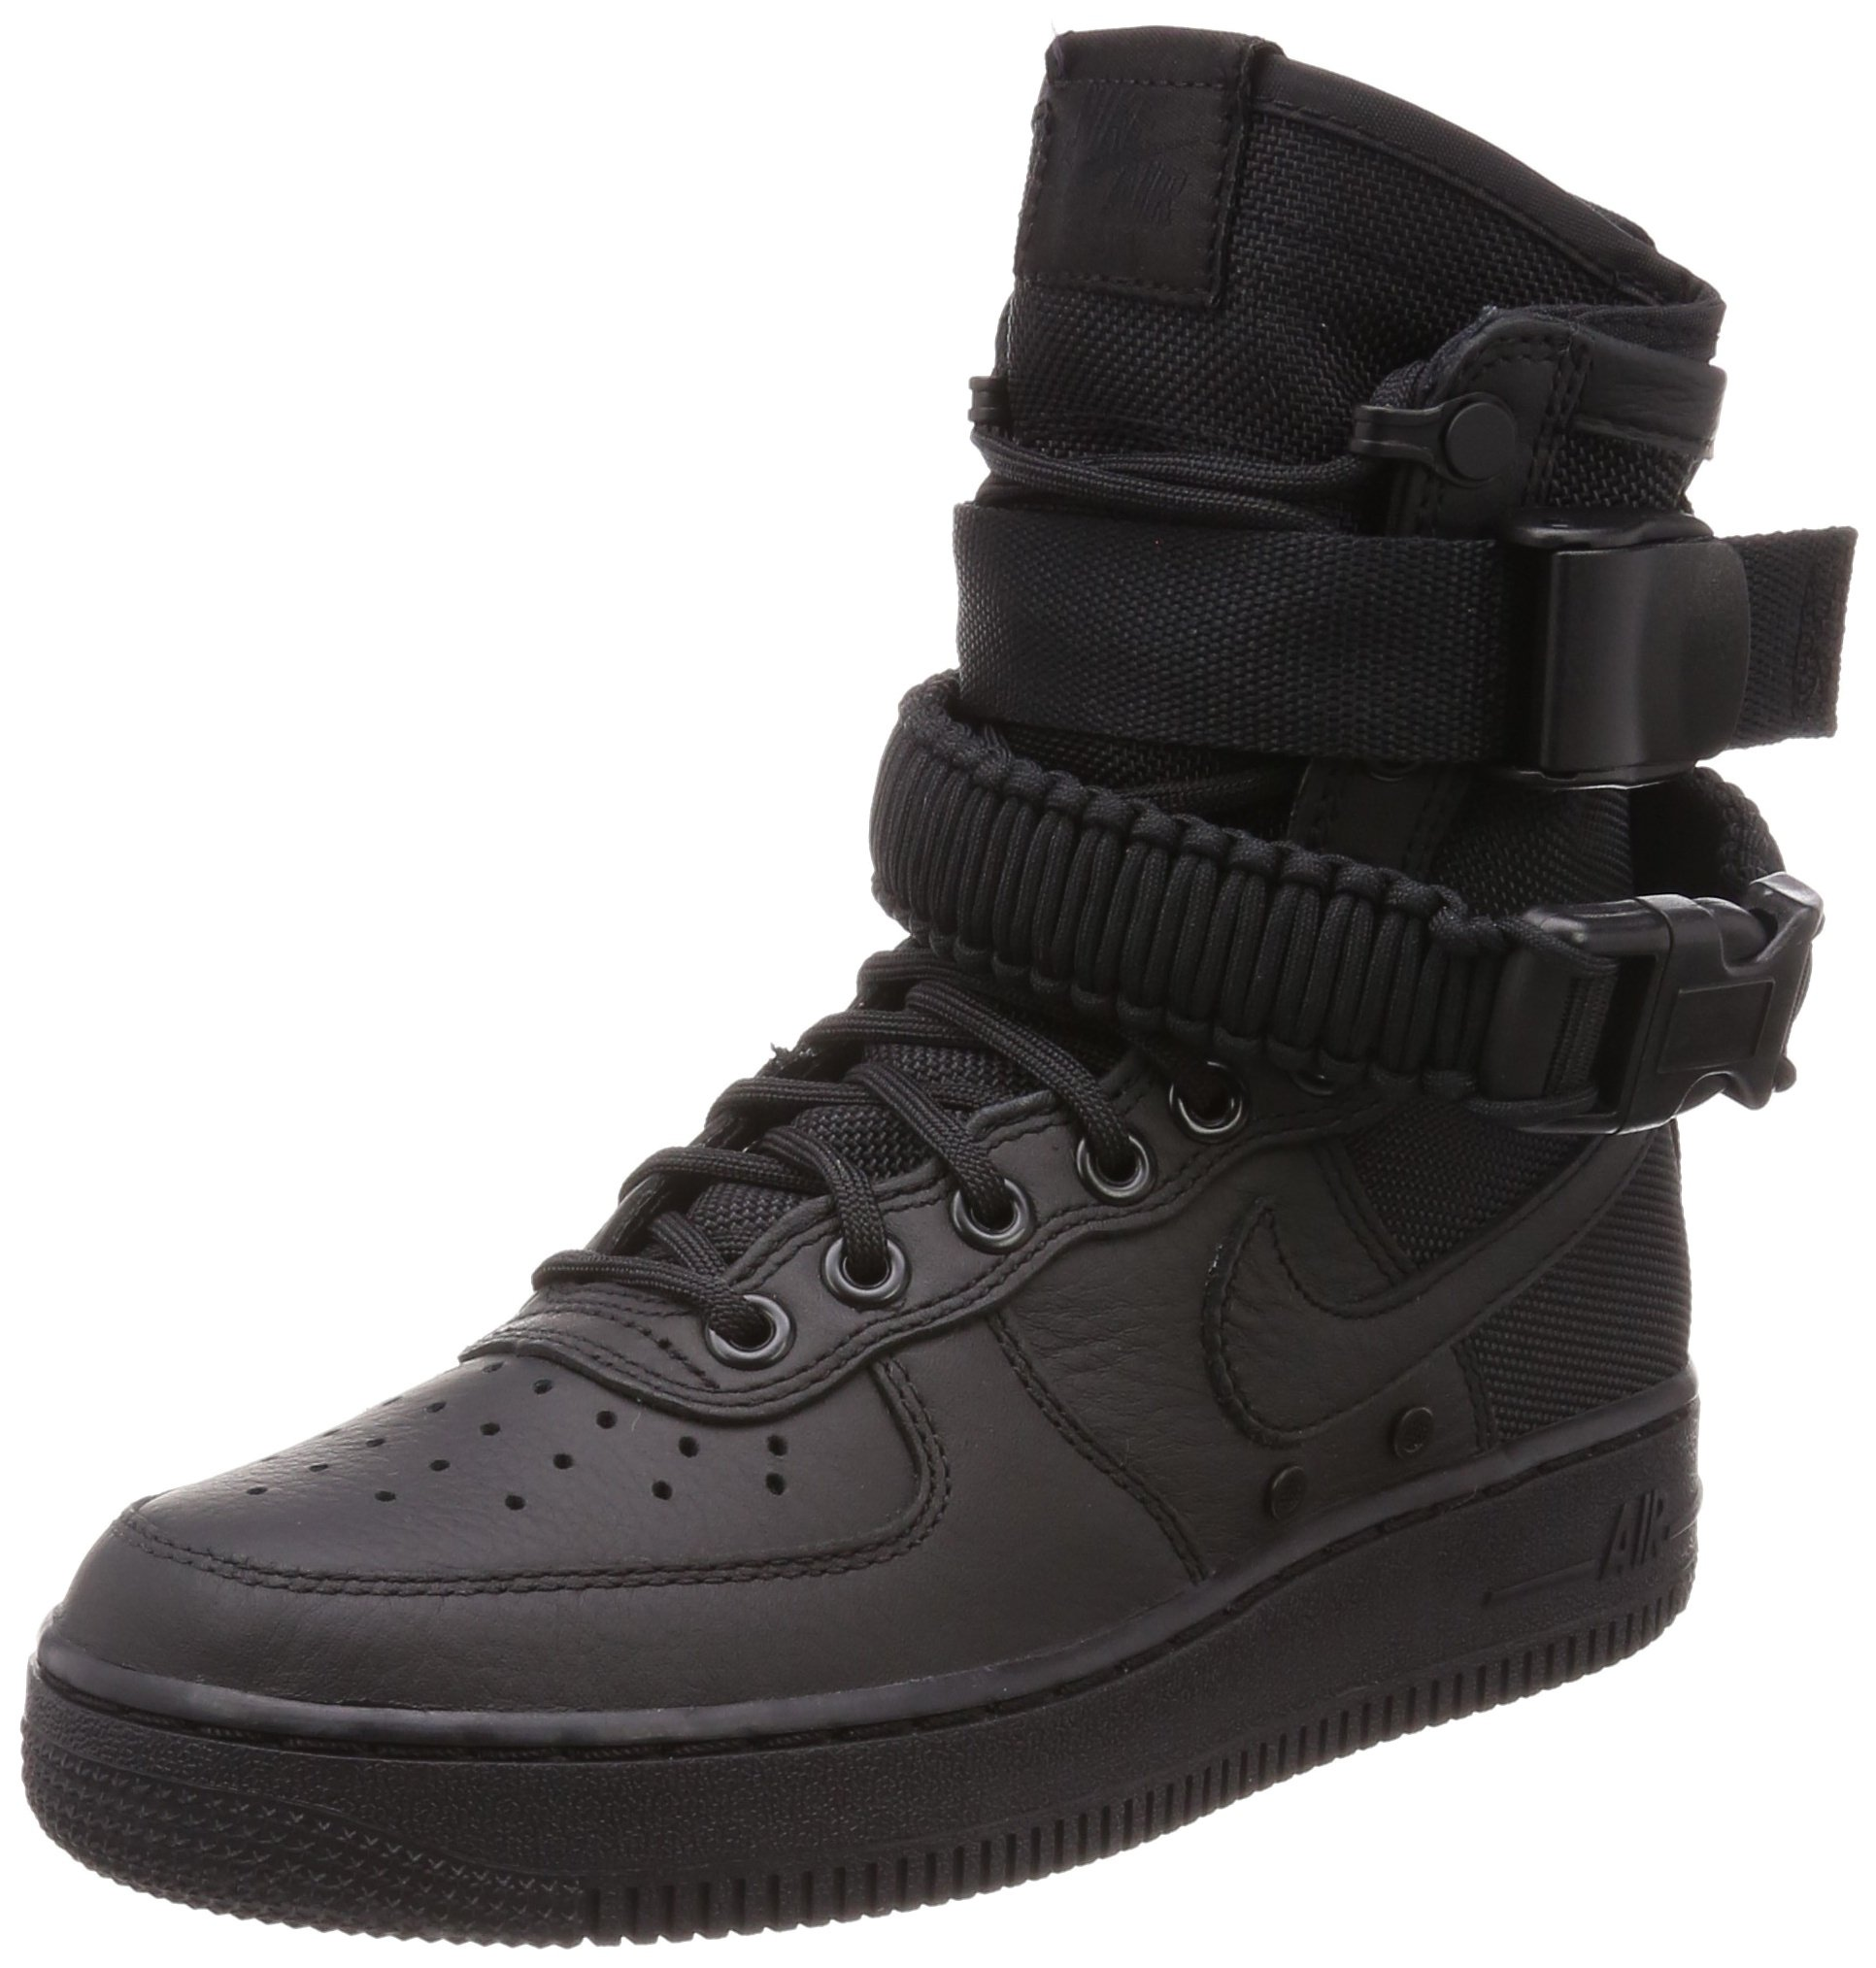 86e23a59e Galleon - Nike Women's SF AF1 Black/Black Black Casual Shoe 7 Women US